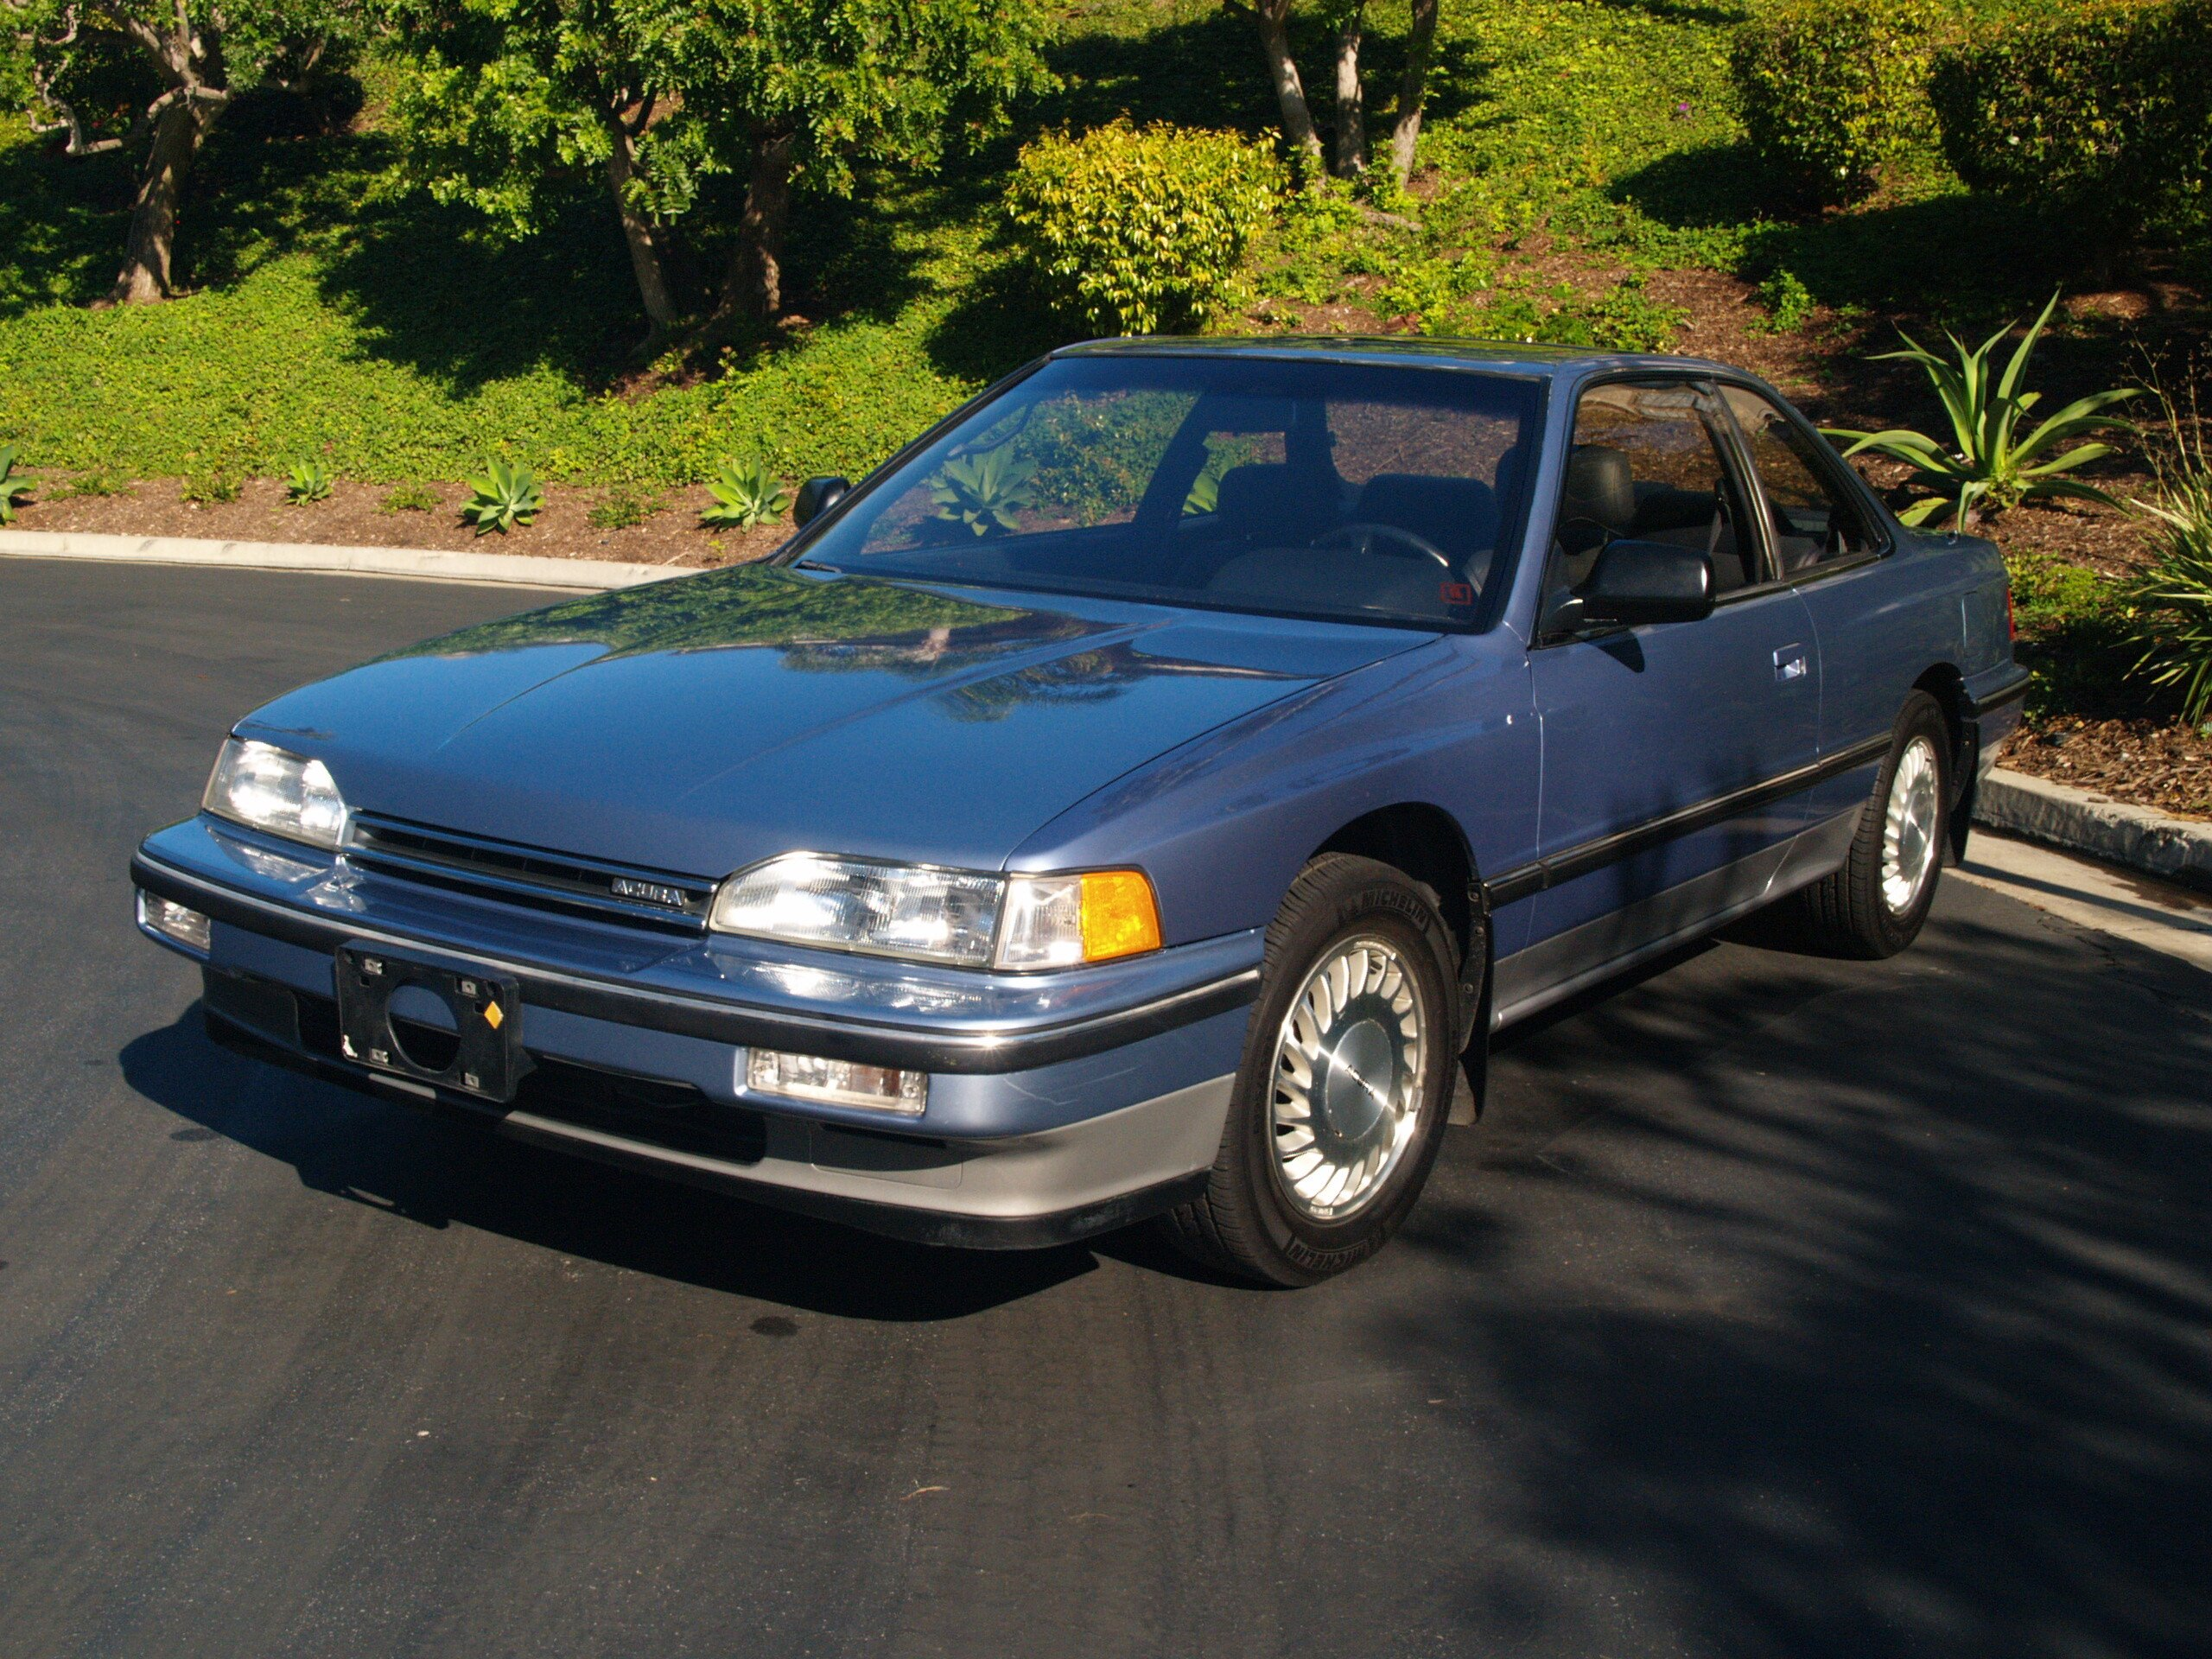 1989 acura legend ls coupe for sale near newport beach california rh classics autotrader com 1995 Acura Legend 1987 Acura Legend